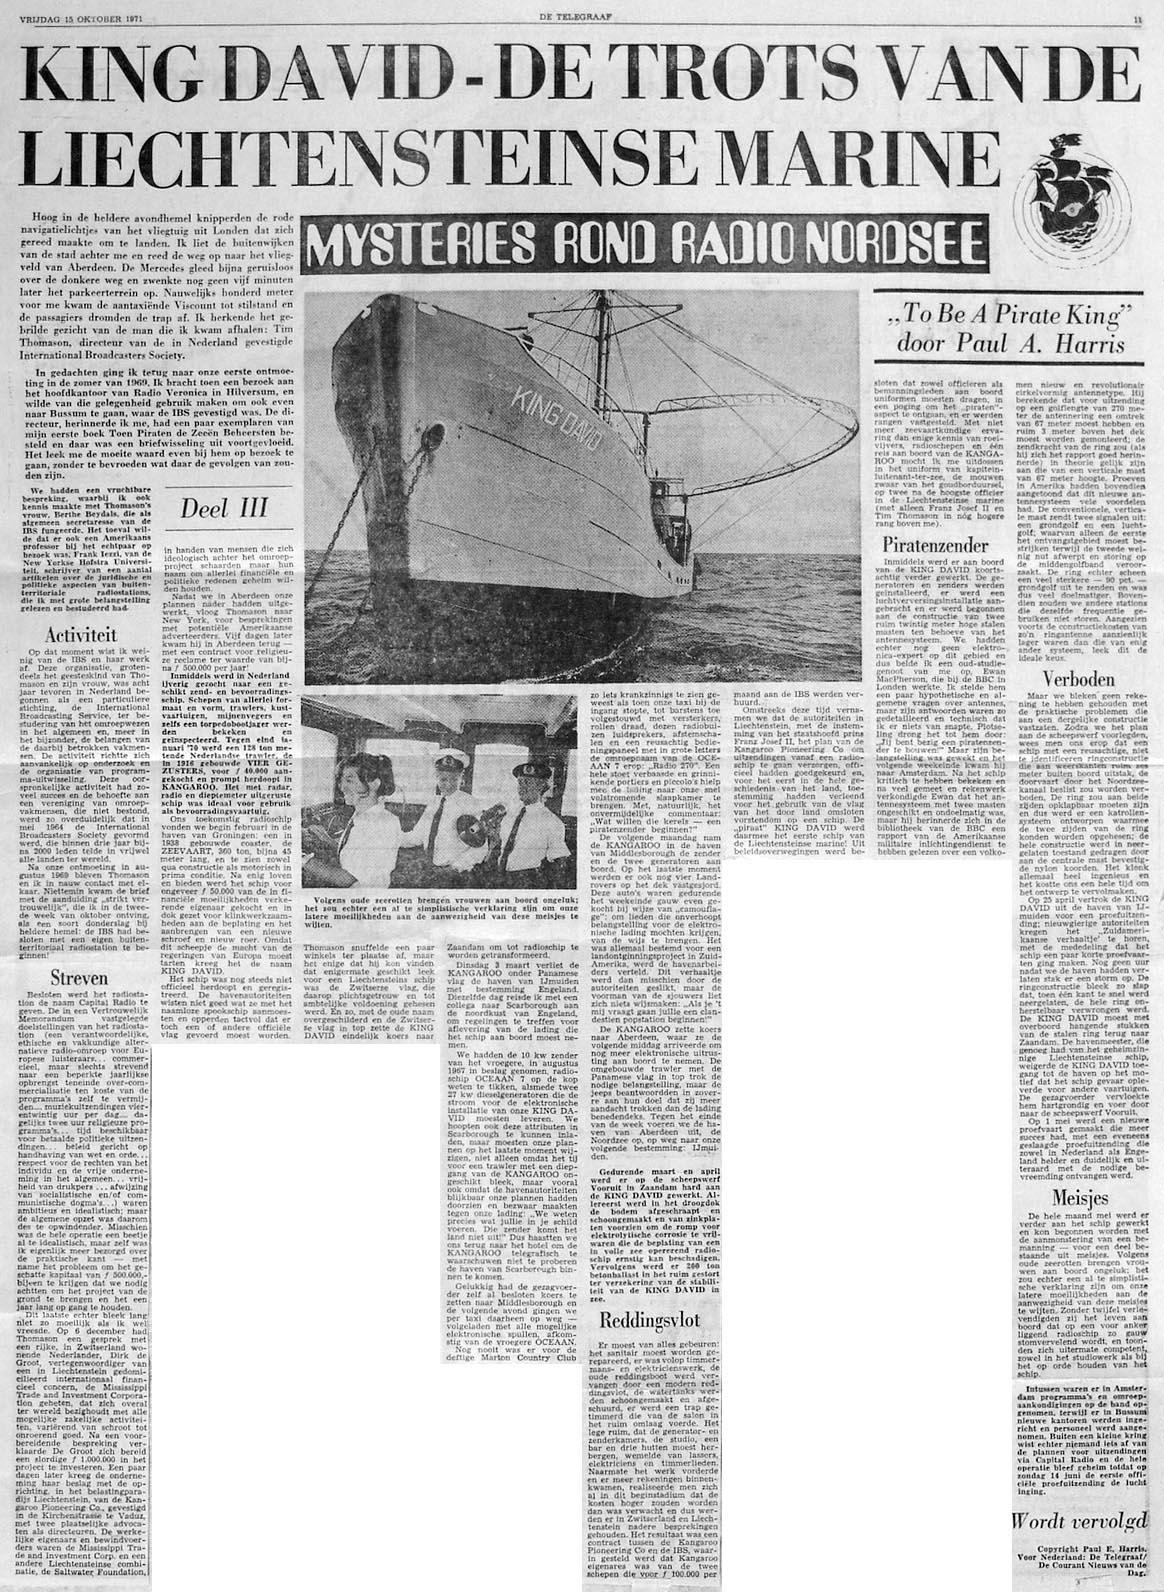 1971-10-15 Telegraaf King David Liechtenstein trots01.jpg